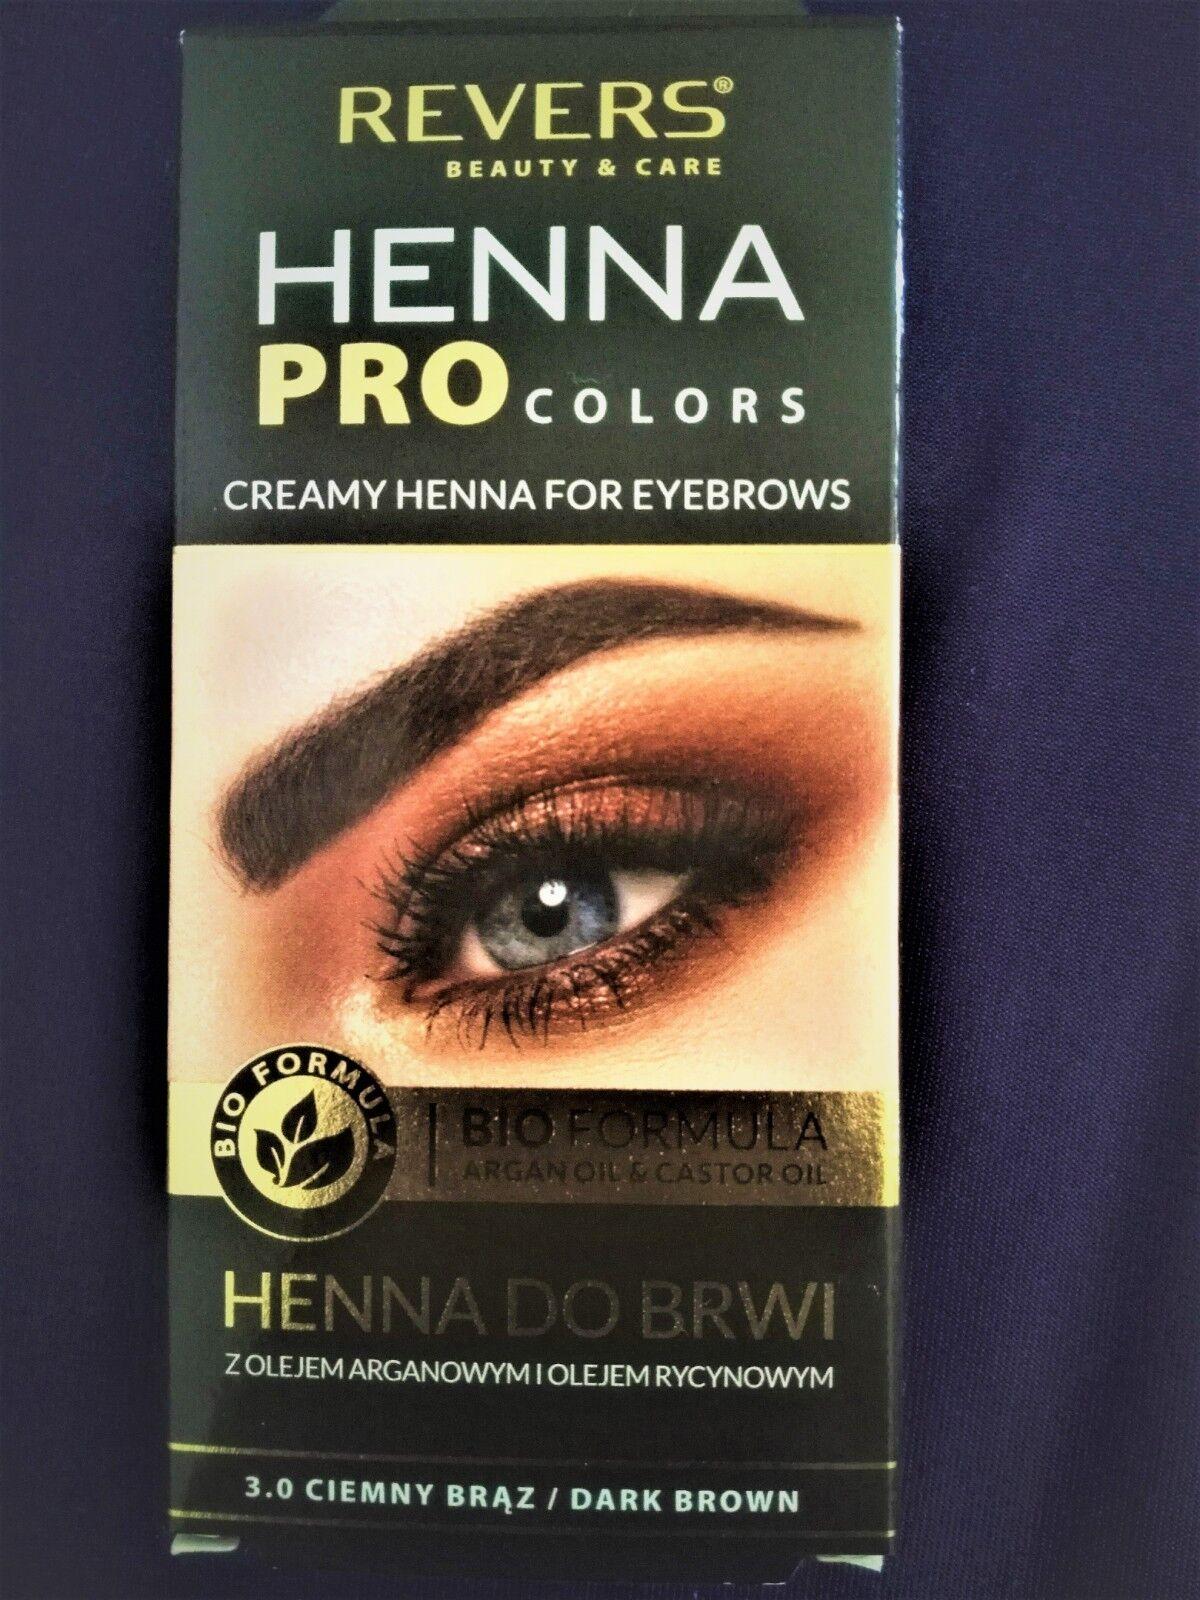 Argan Oil Eyebrows : argan, eyebrows, Formula, Revers, Argan&castor, Brown, Henna, Eyebrows, Colour, Online